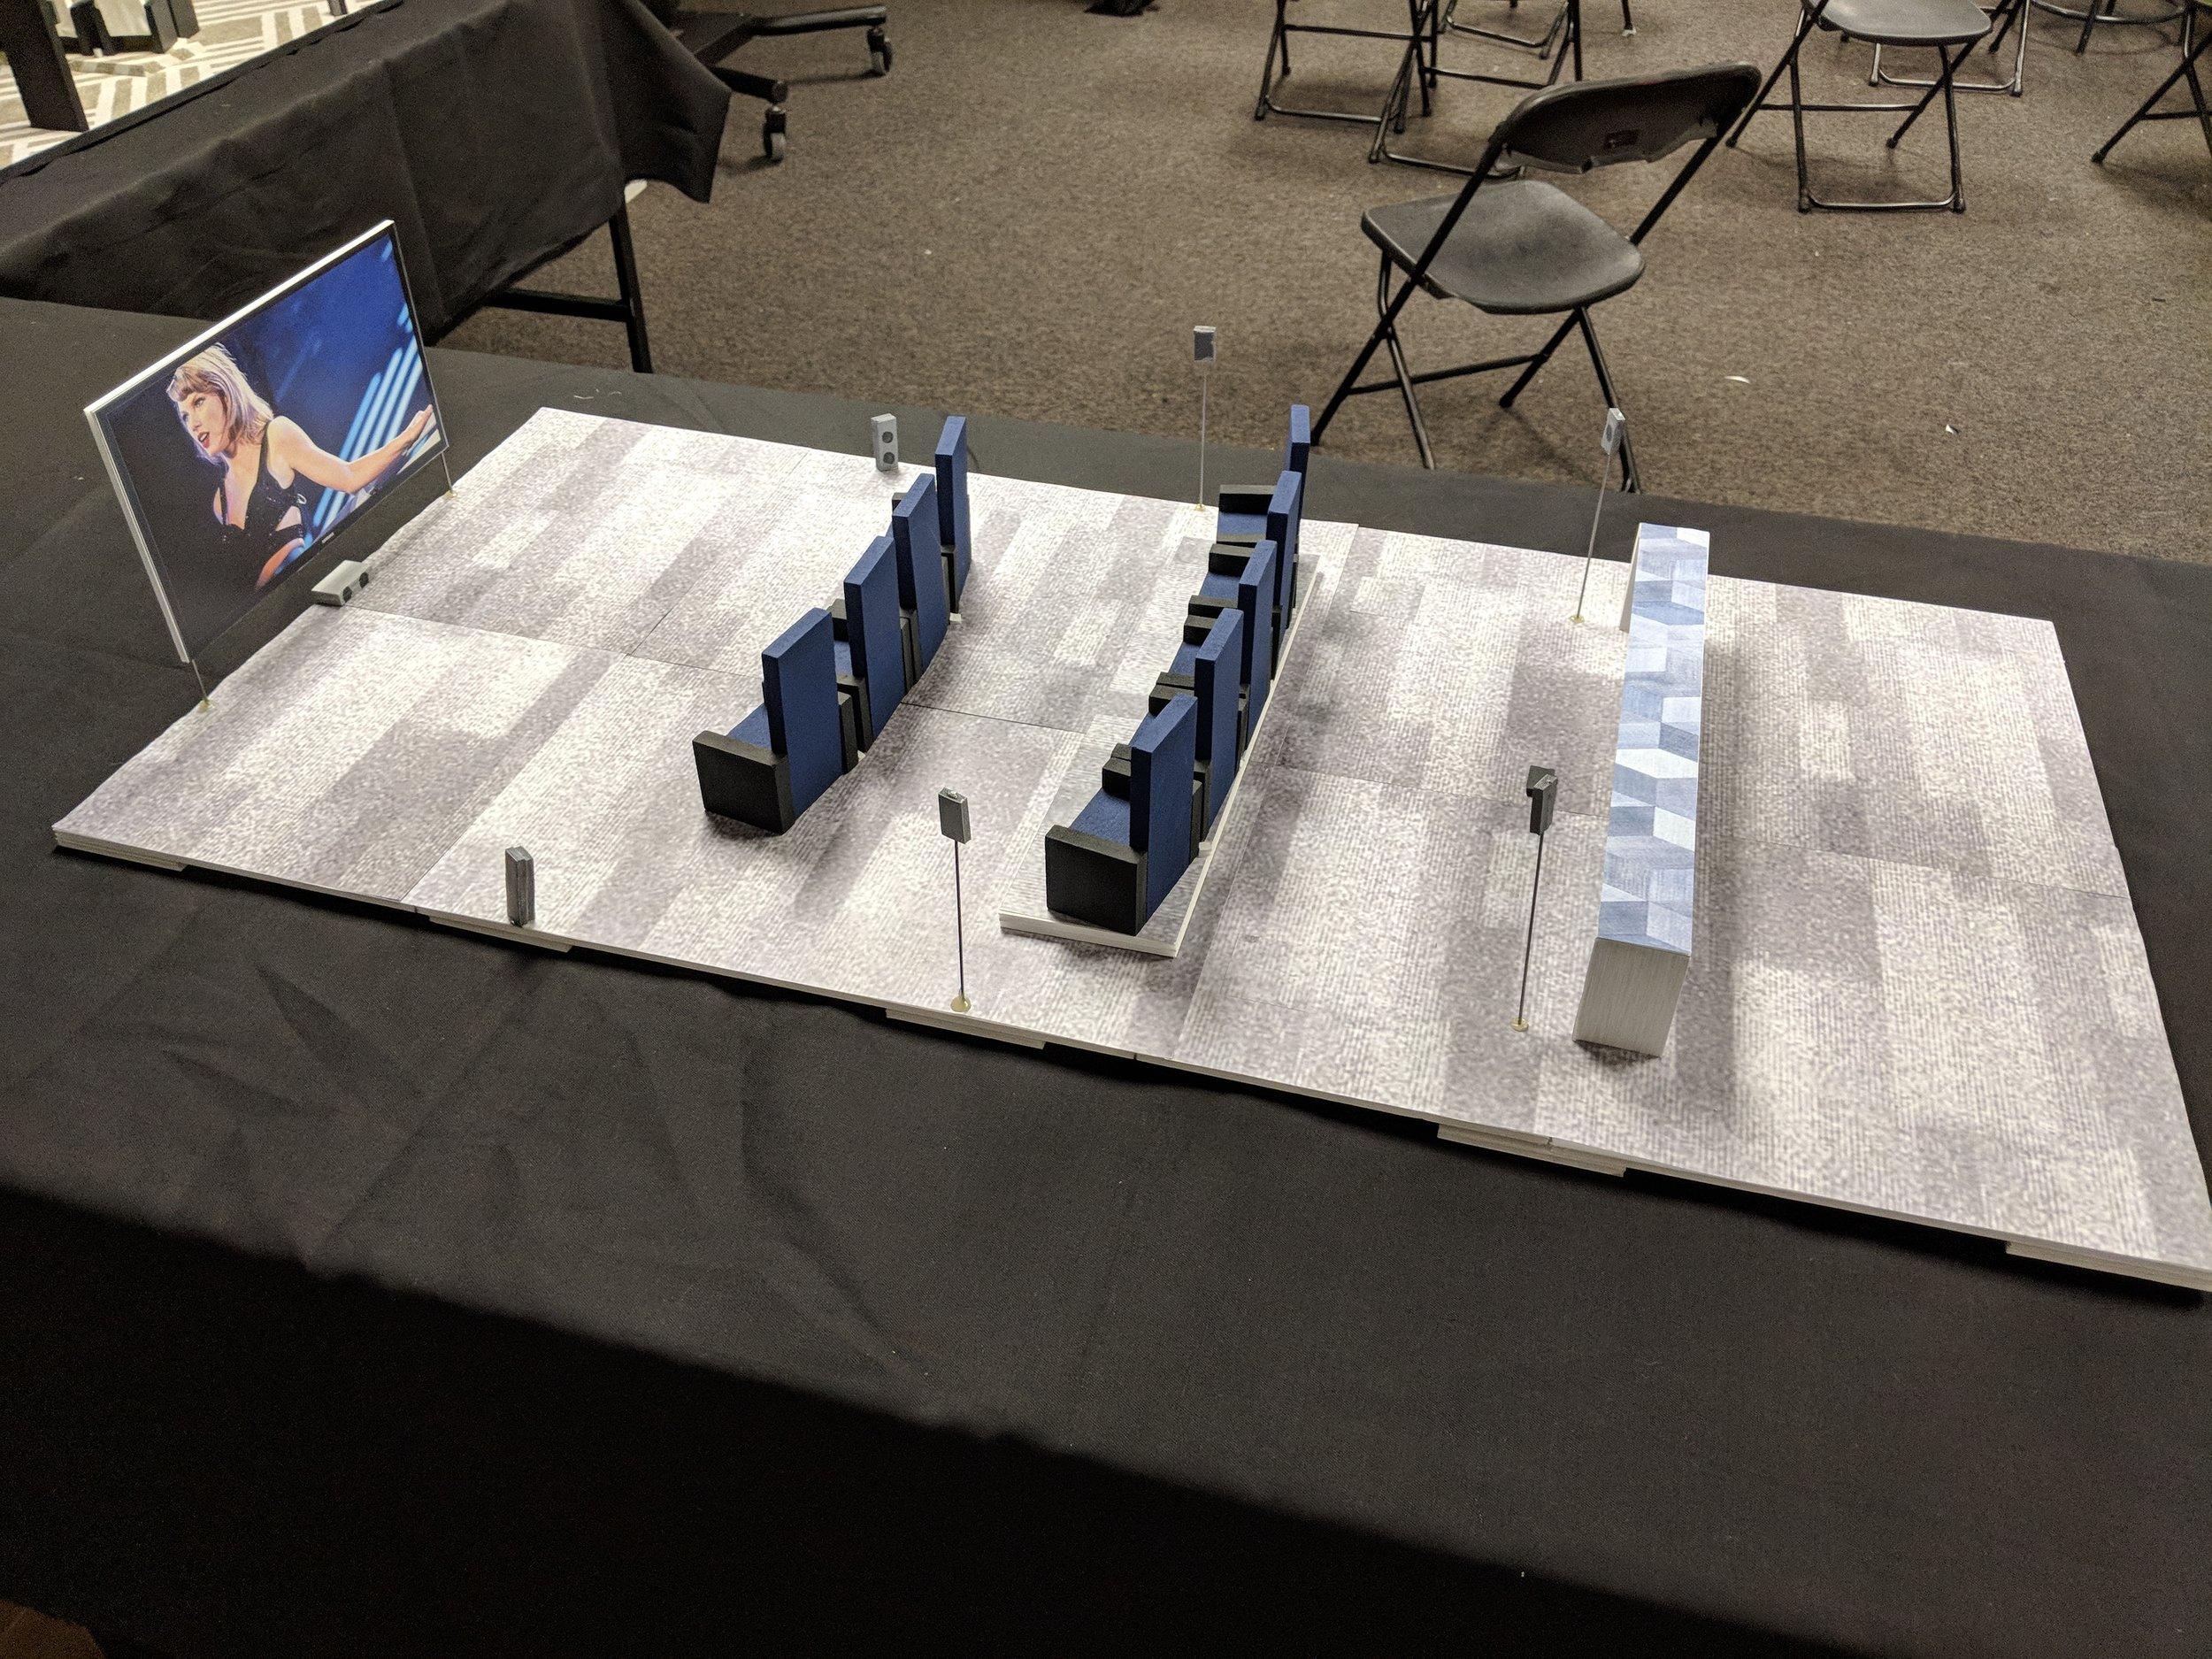 Full Prototype: Nine-Seat Theater